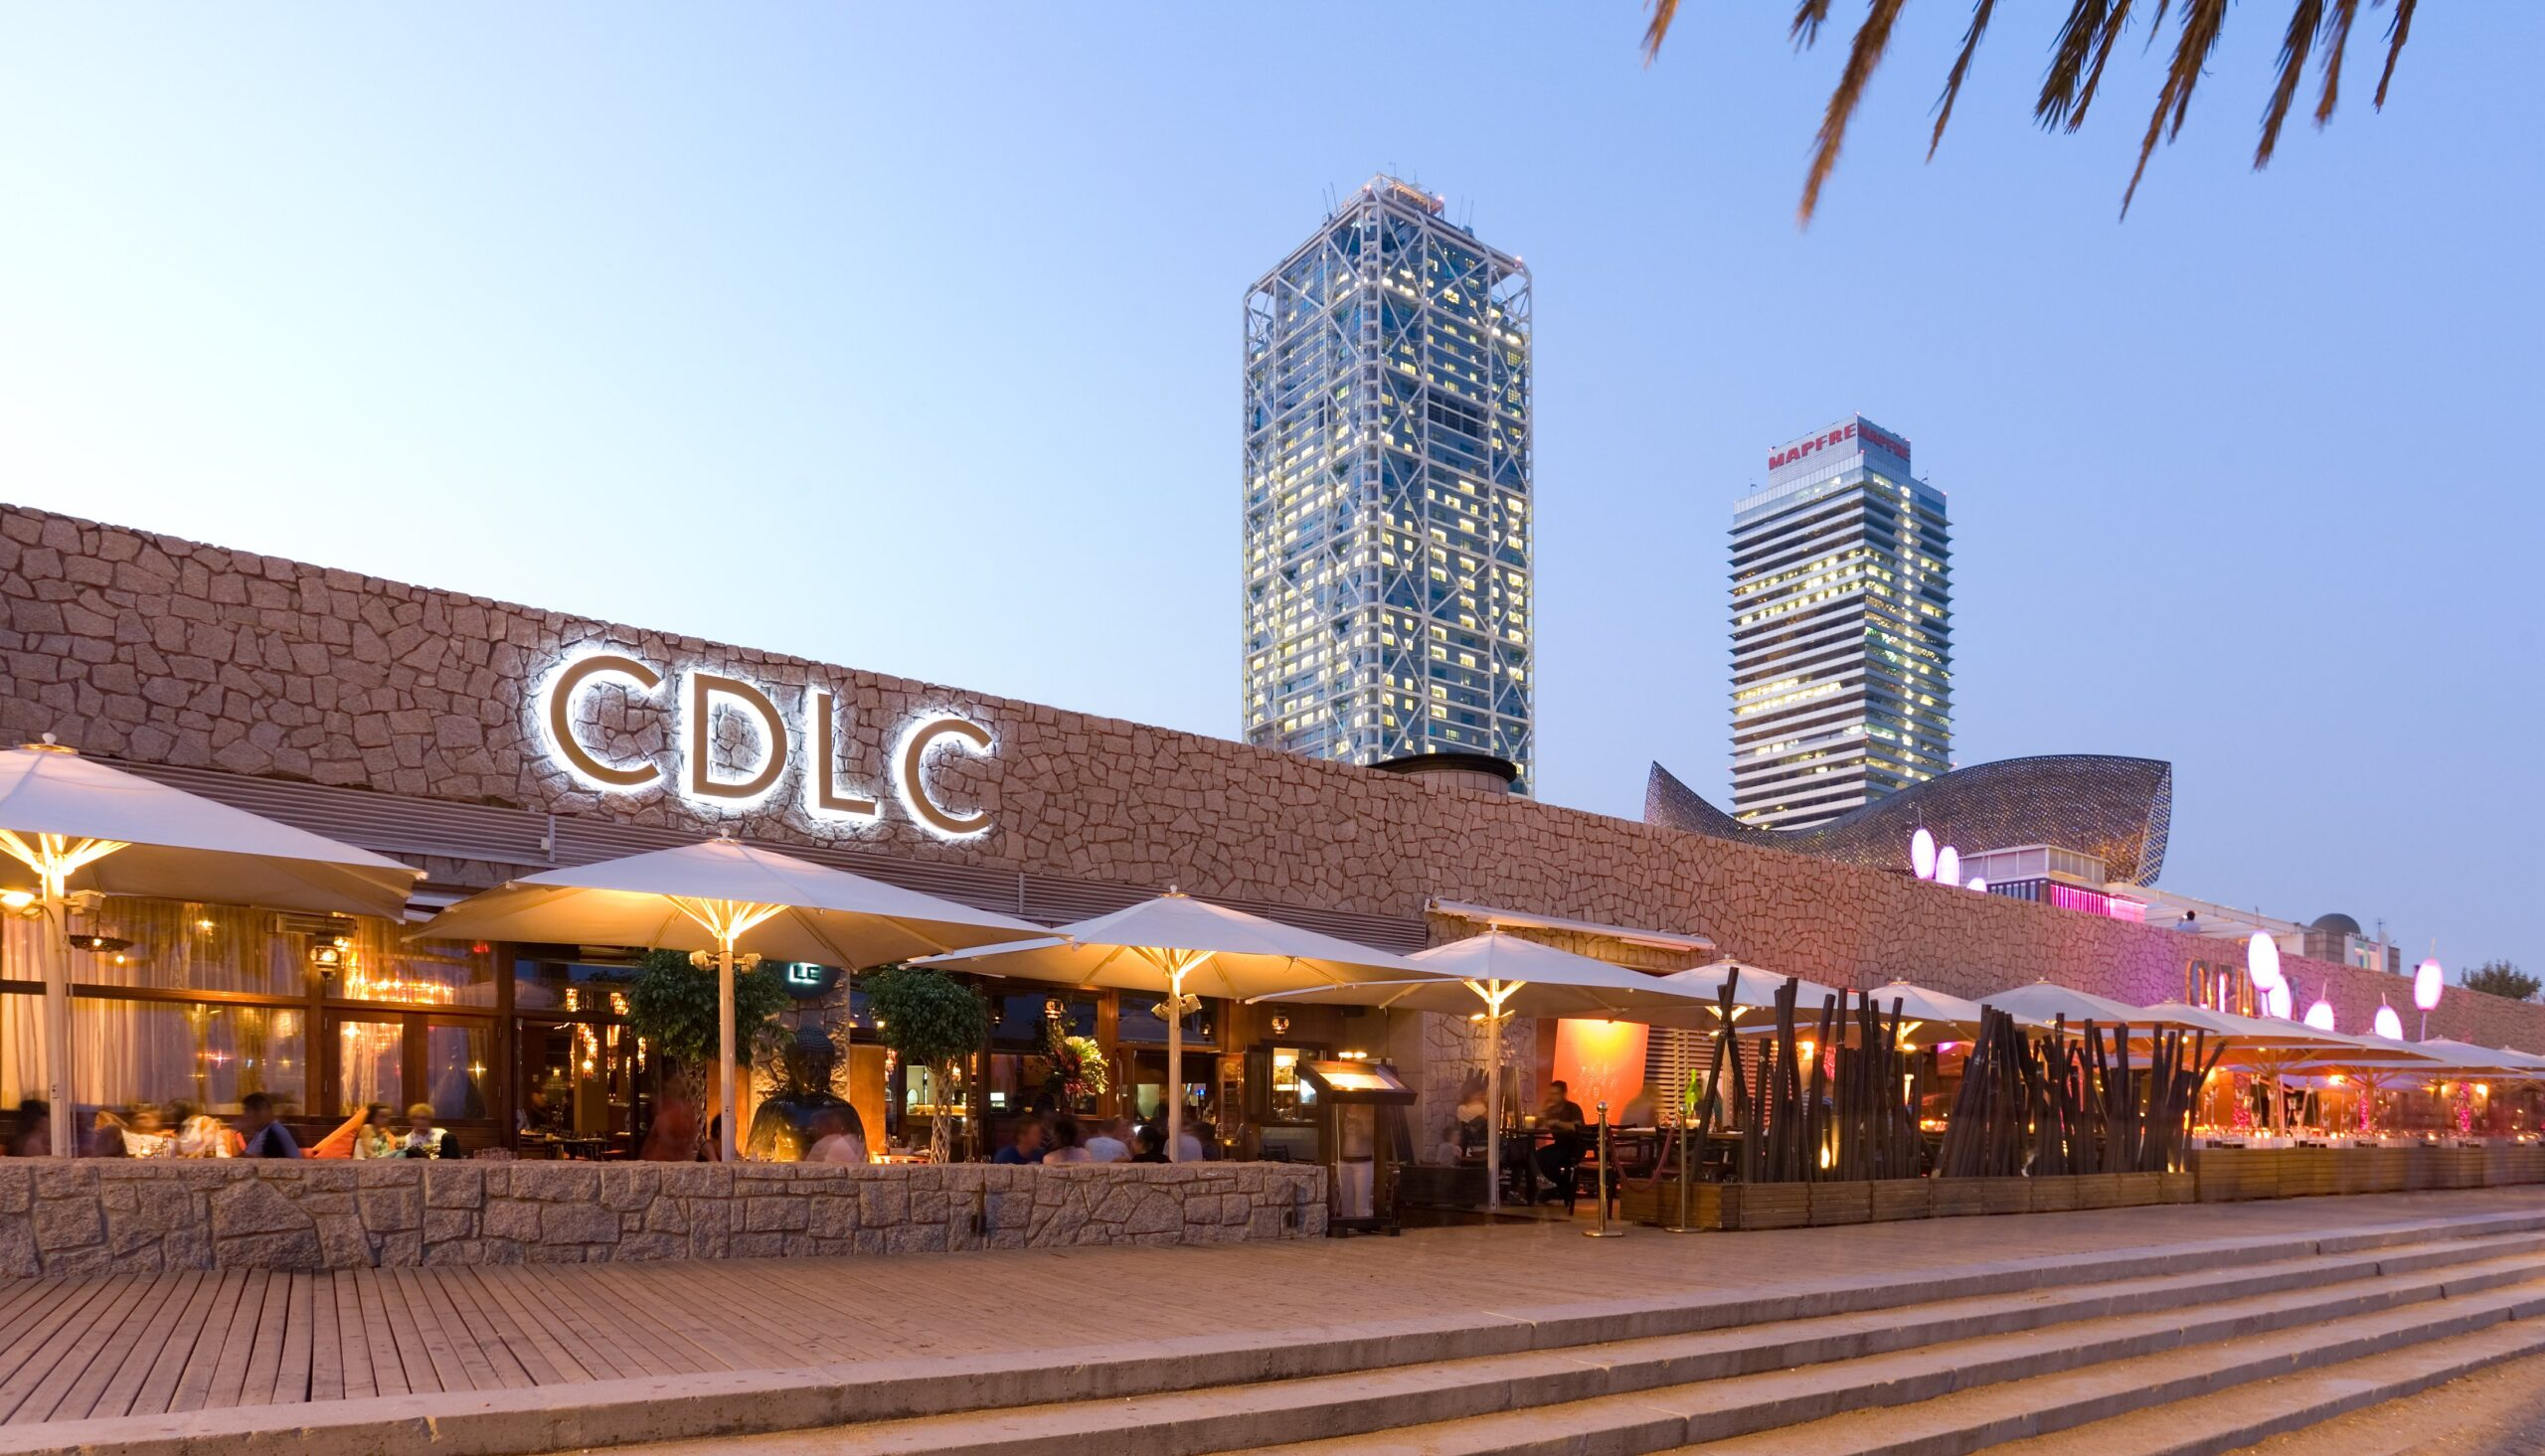 Discoteca Carpe Diem (Barcelona)